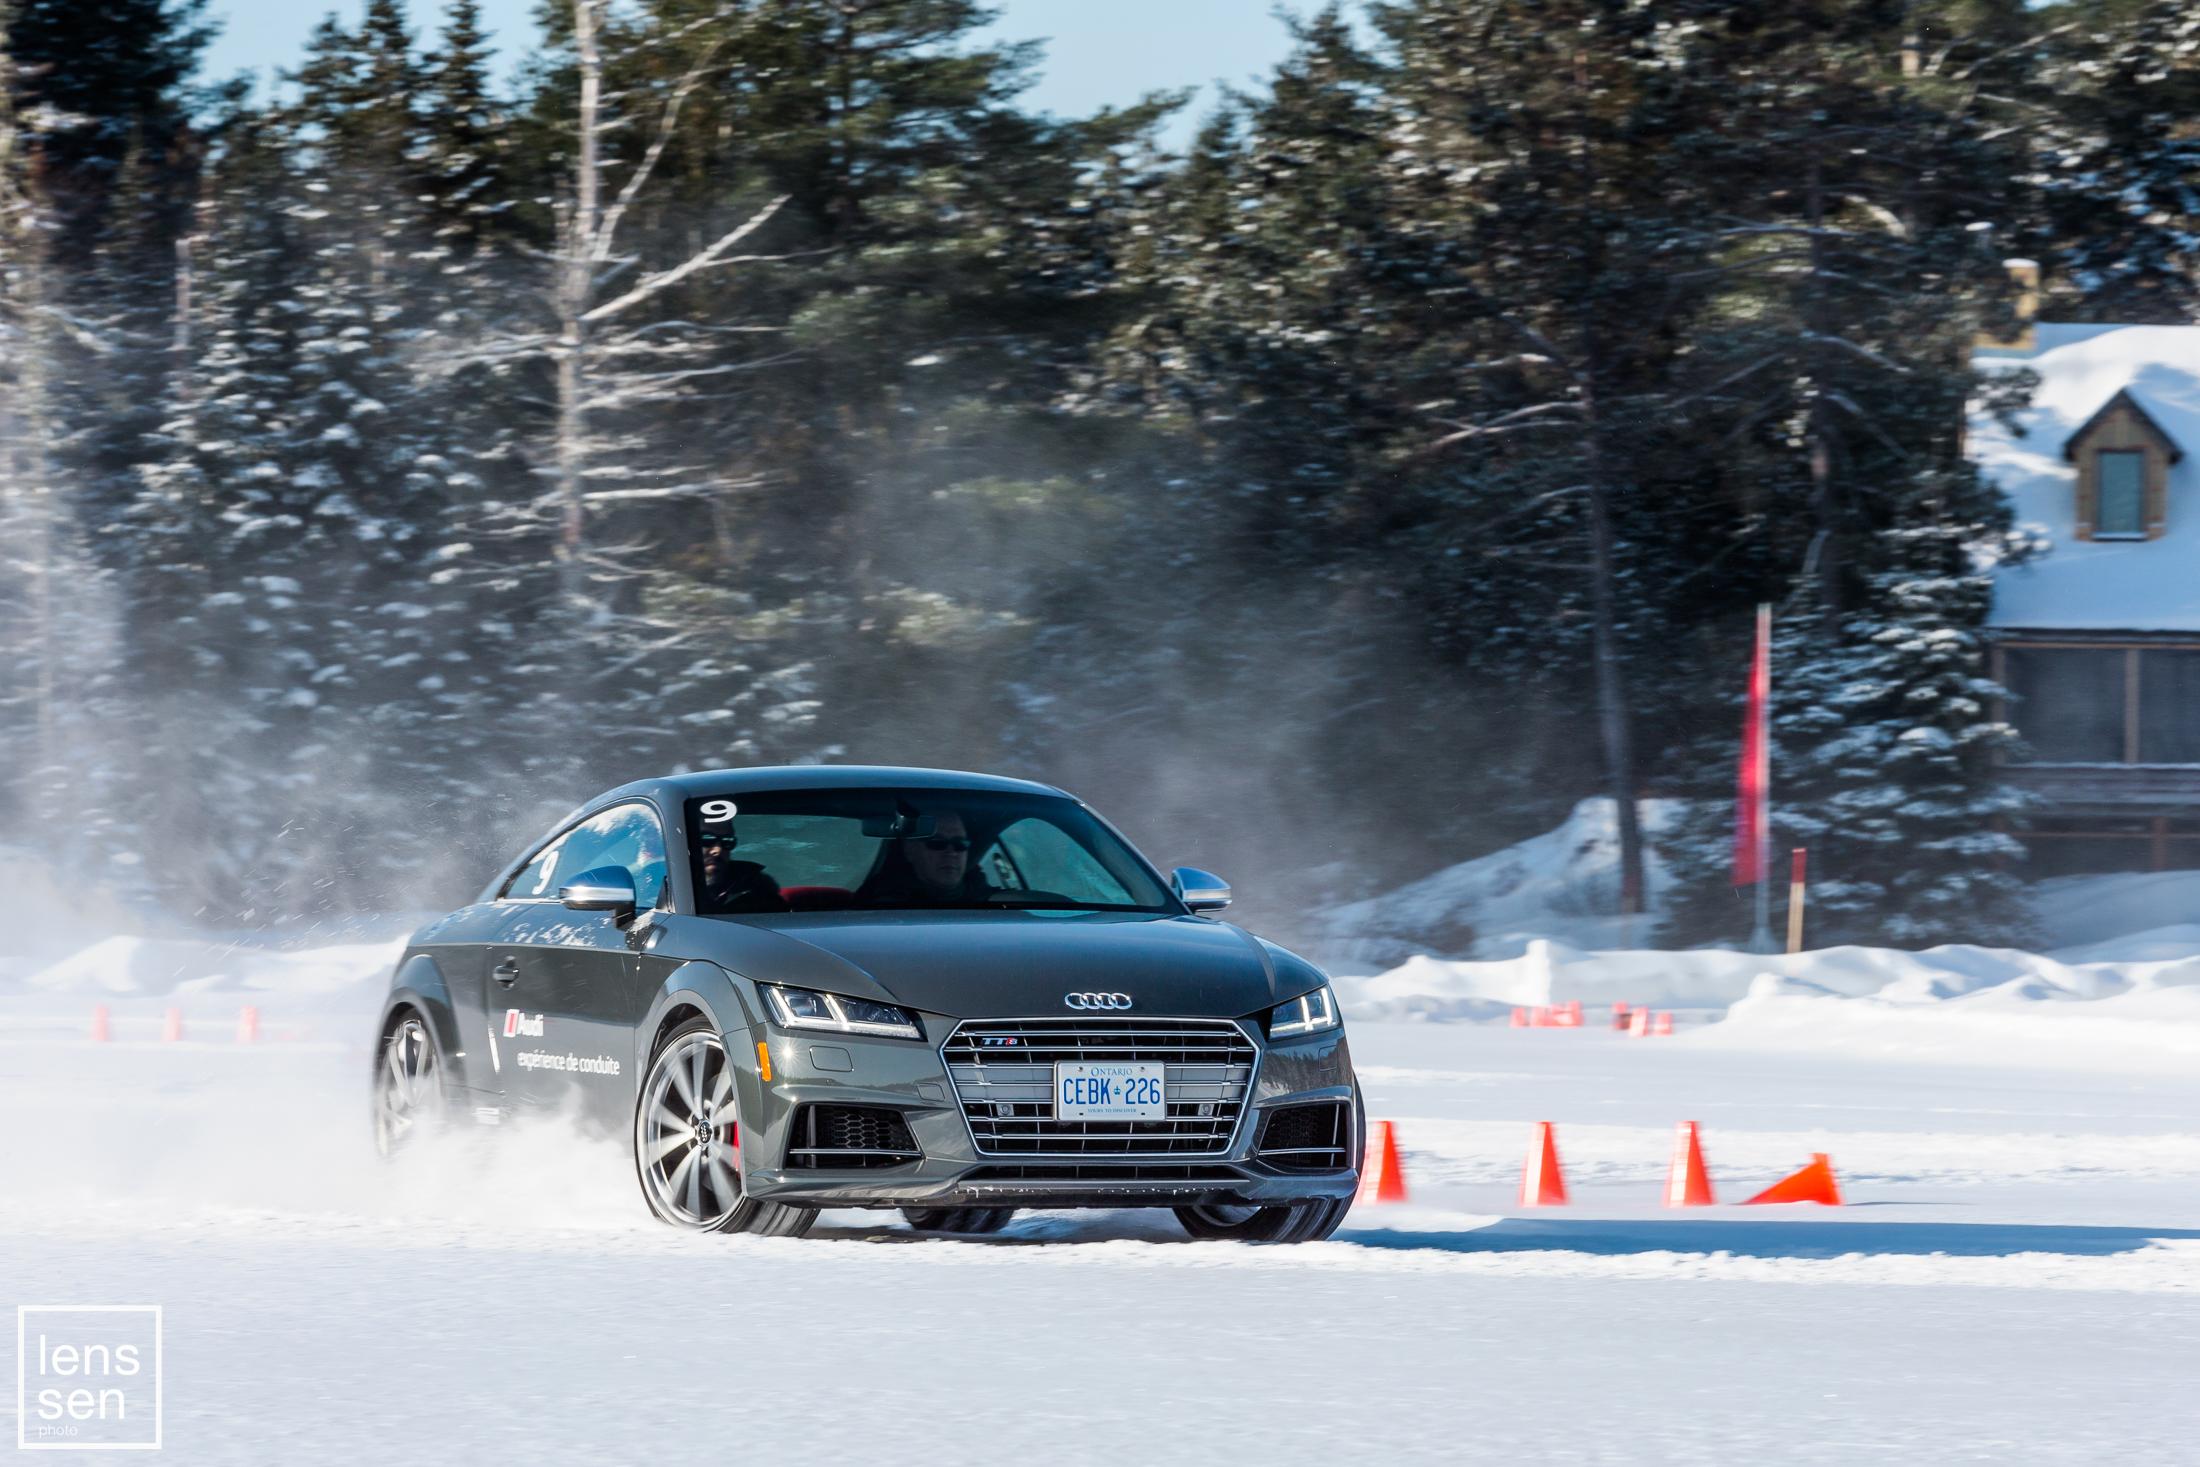 Audi Ice Experience - Sacacomie QC - Feb 2018 - 25 -1387.jpg